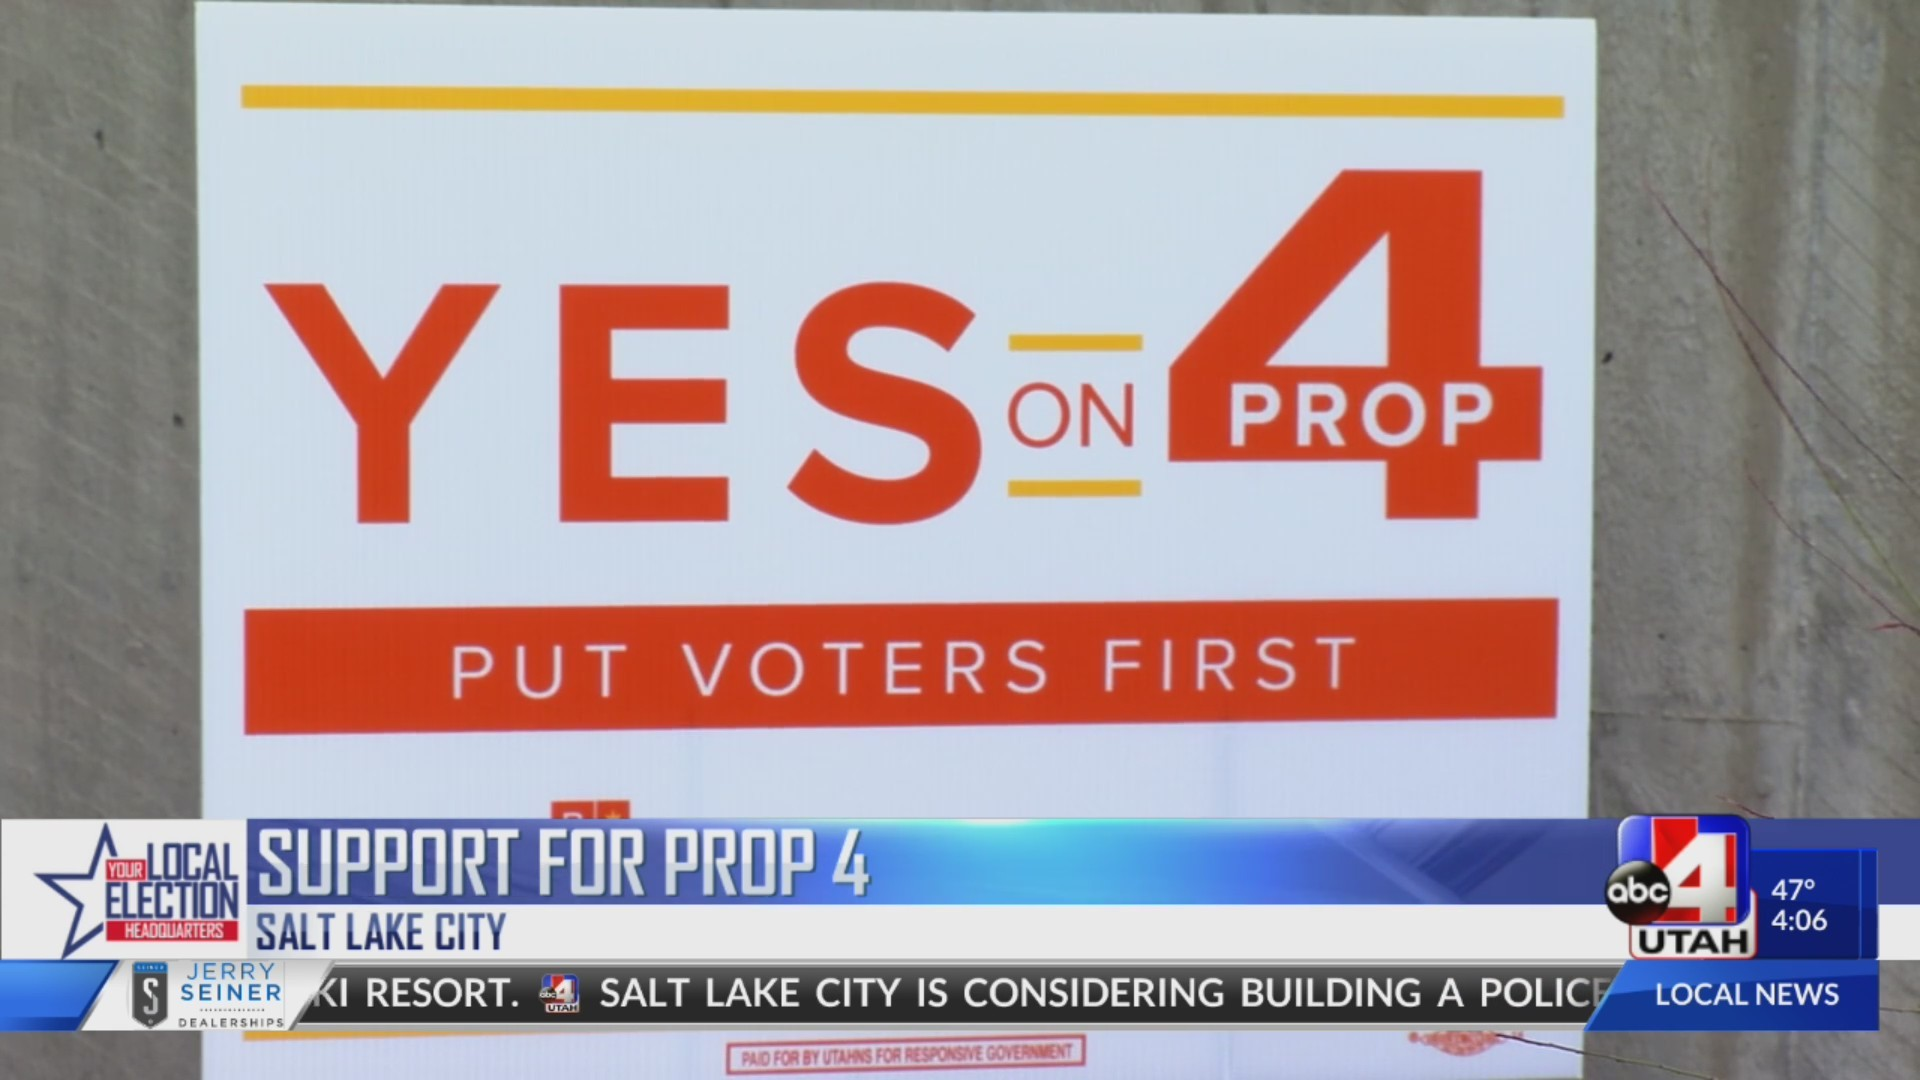 Prop 4 proponents encourage college students to vote